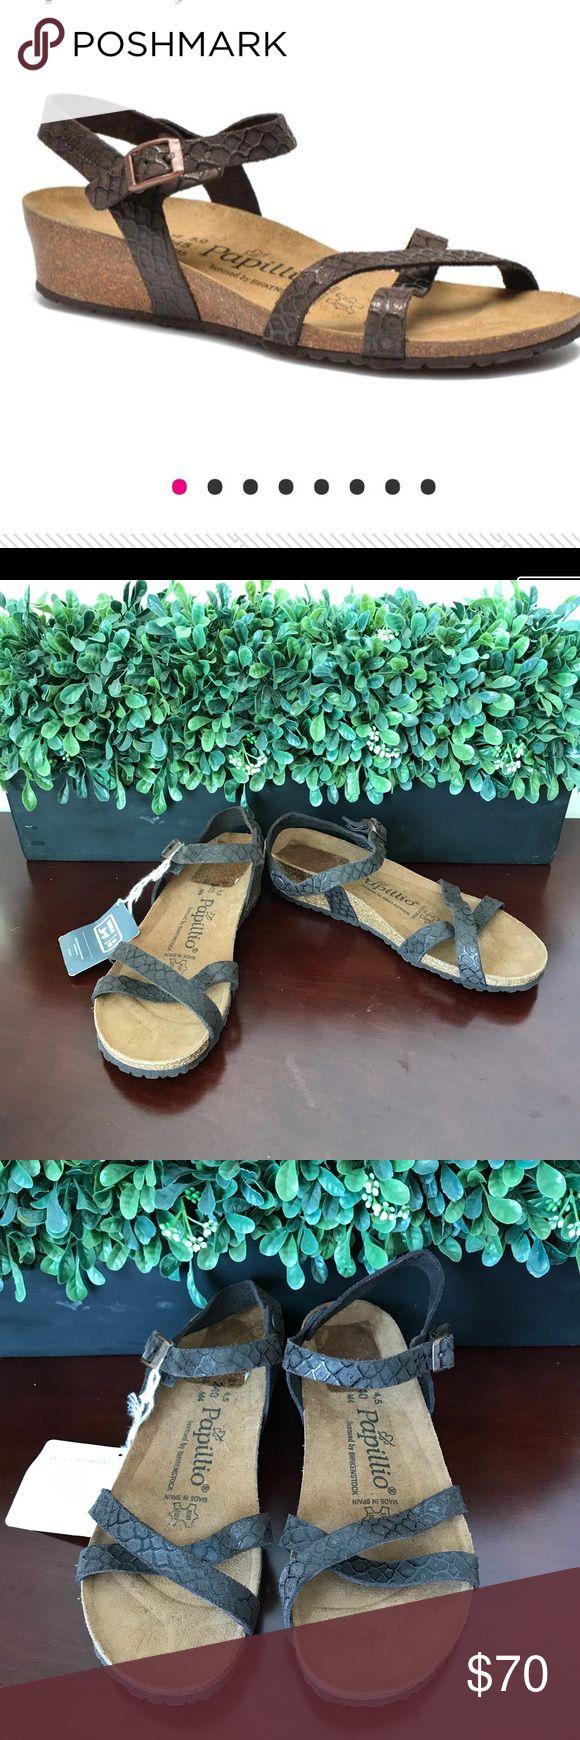 Birkenstock Papillio Wedge Sandal ✨ Birkenstock Papillio Alyssa Wedge Sandal in mocha brown with snake like print. Size 37. New with tags. Birkenstock Shoes Sandals